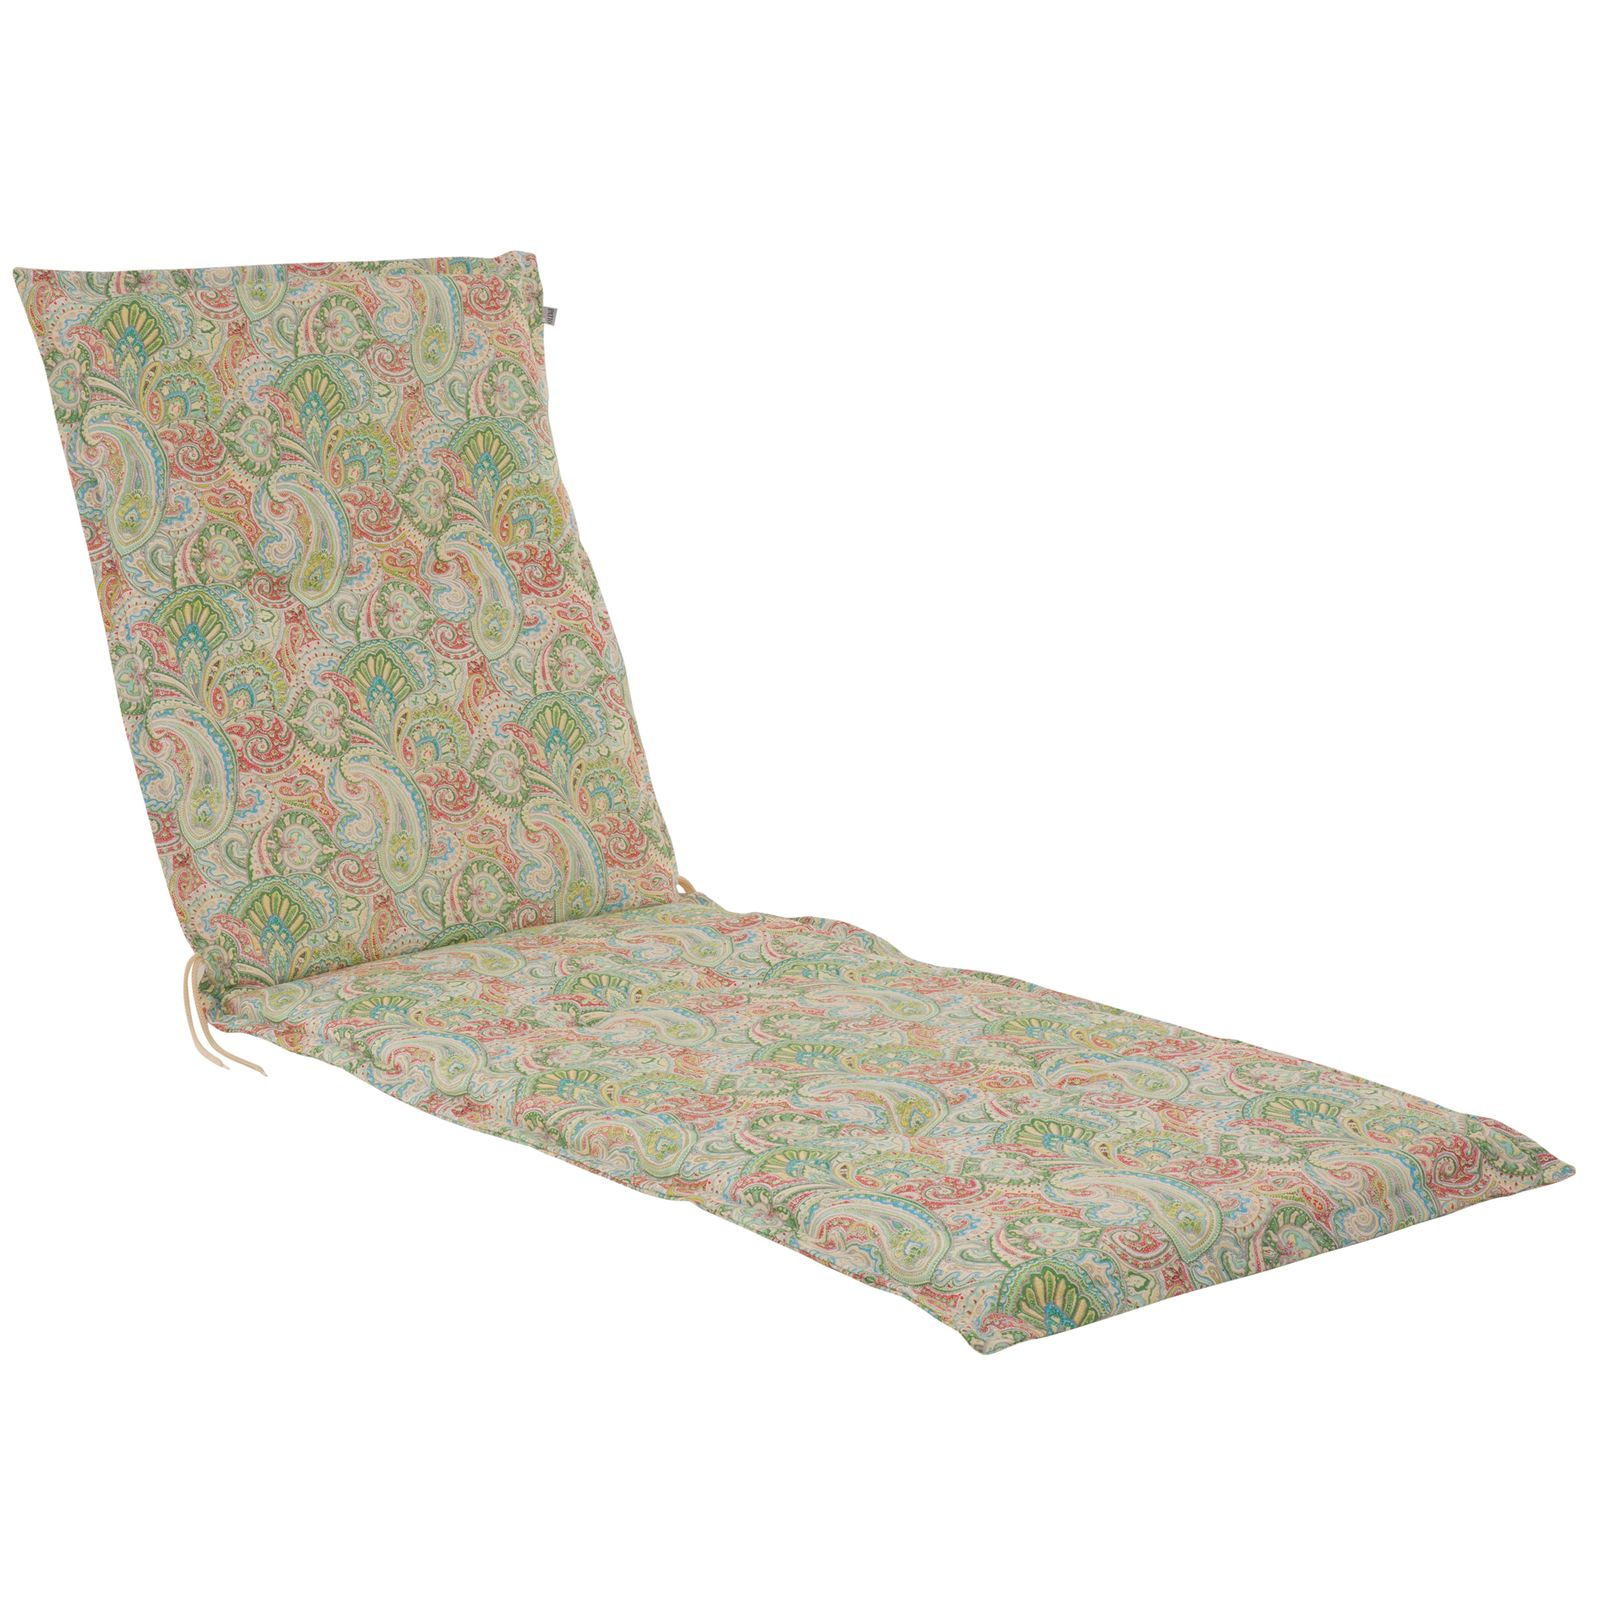 Cojín colchón para tumbona de jardín Malezja Liege 5 cm G038-12LB PATIO